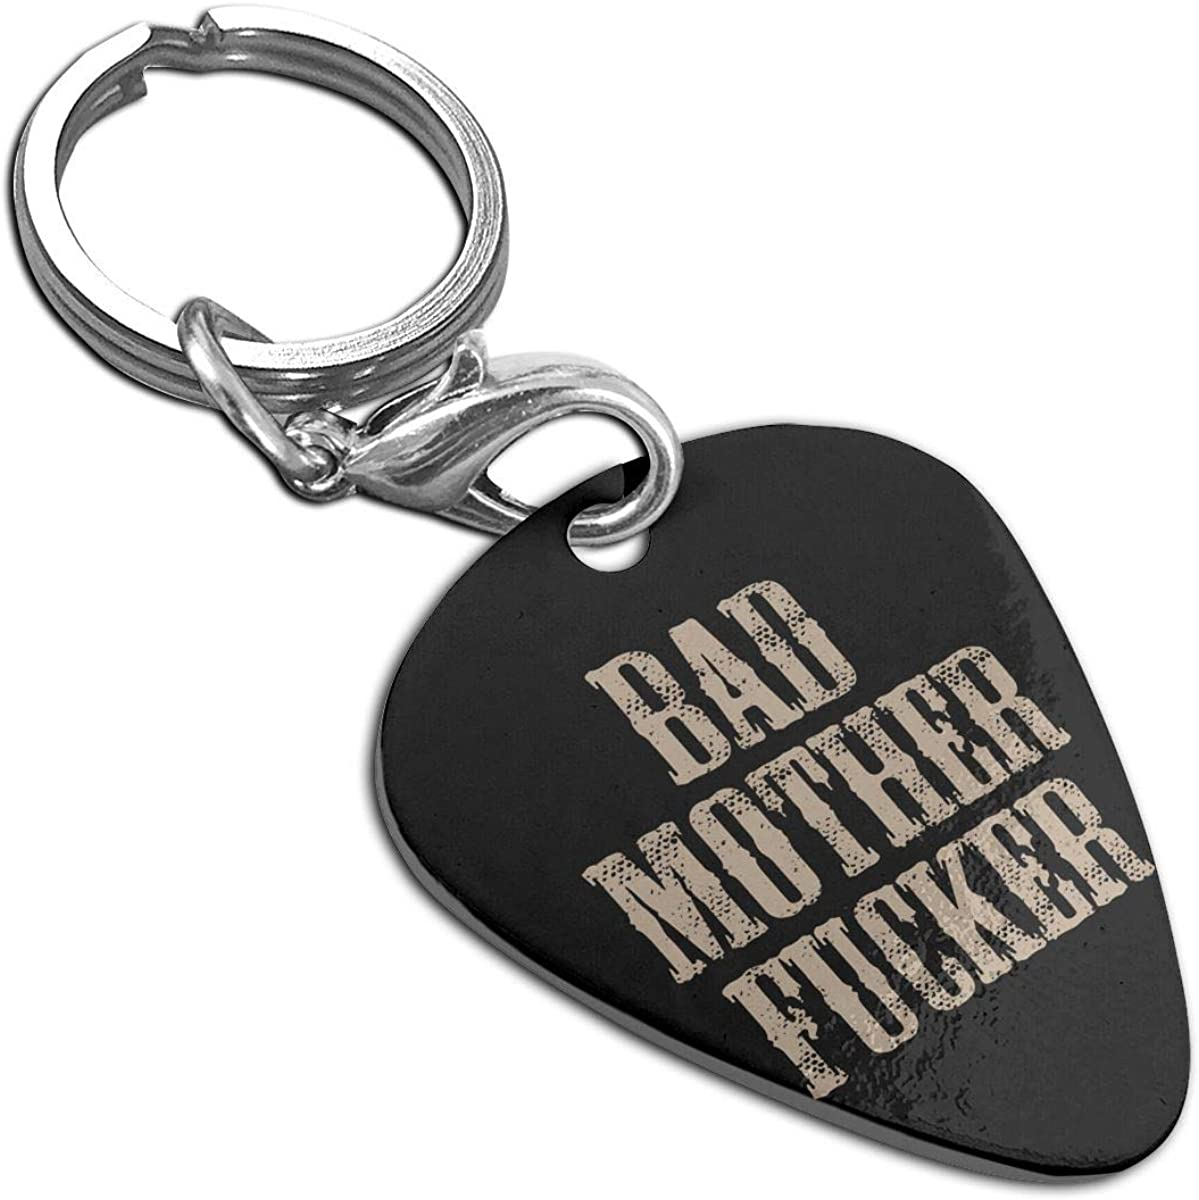 BAD MOTHER FUCKER Custom Guitar Pick Pendant Necklace Keychain